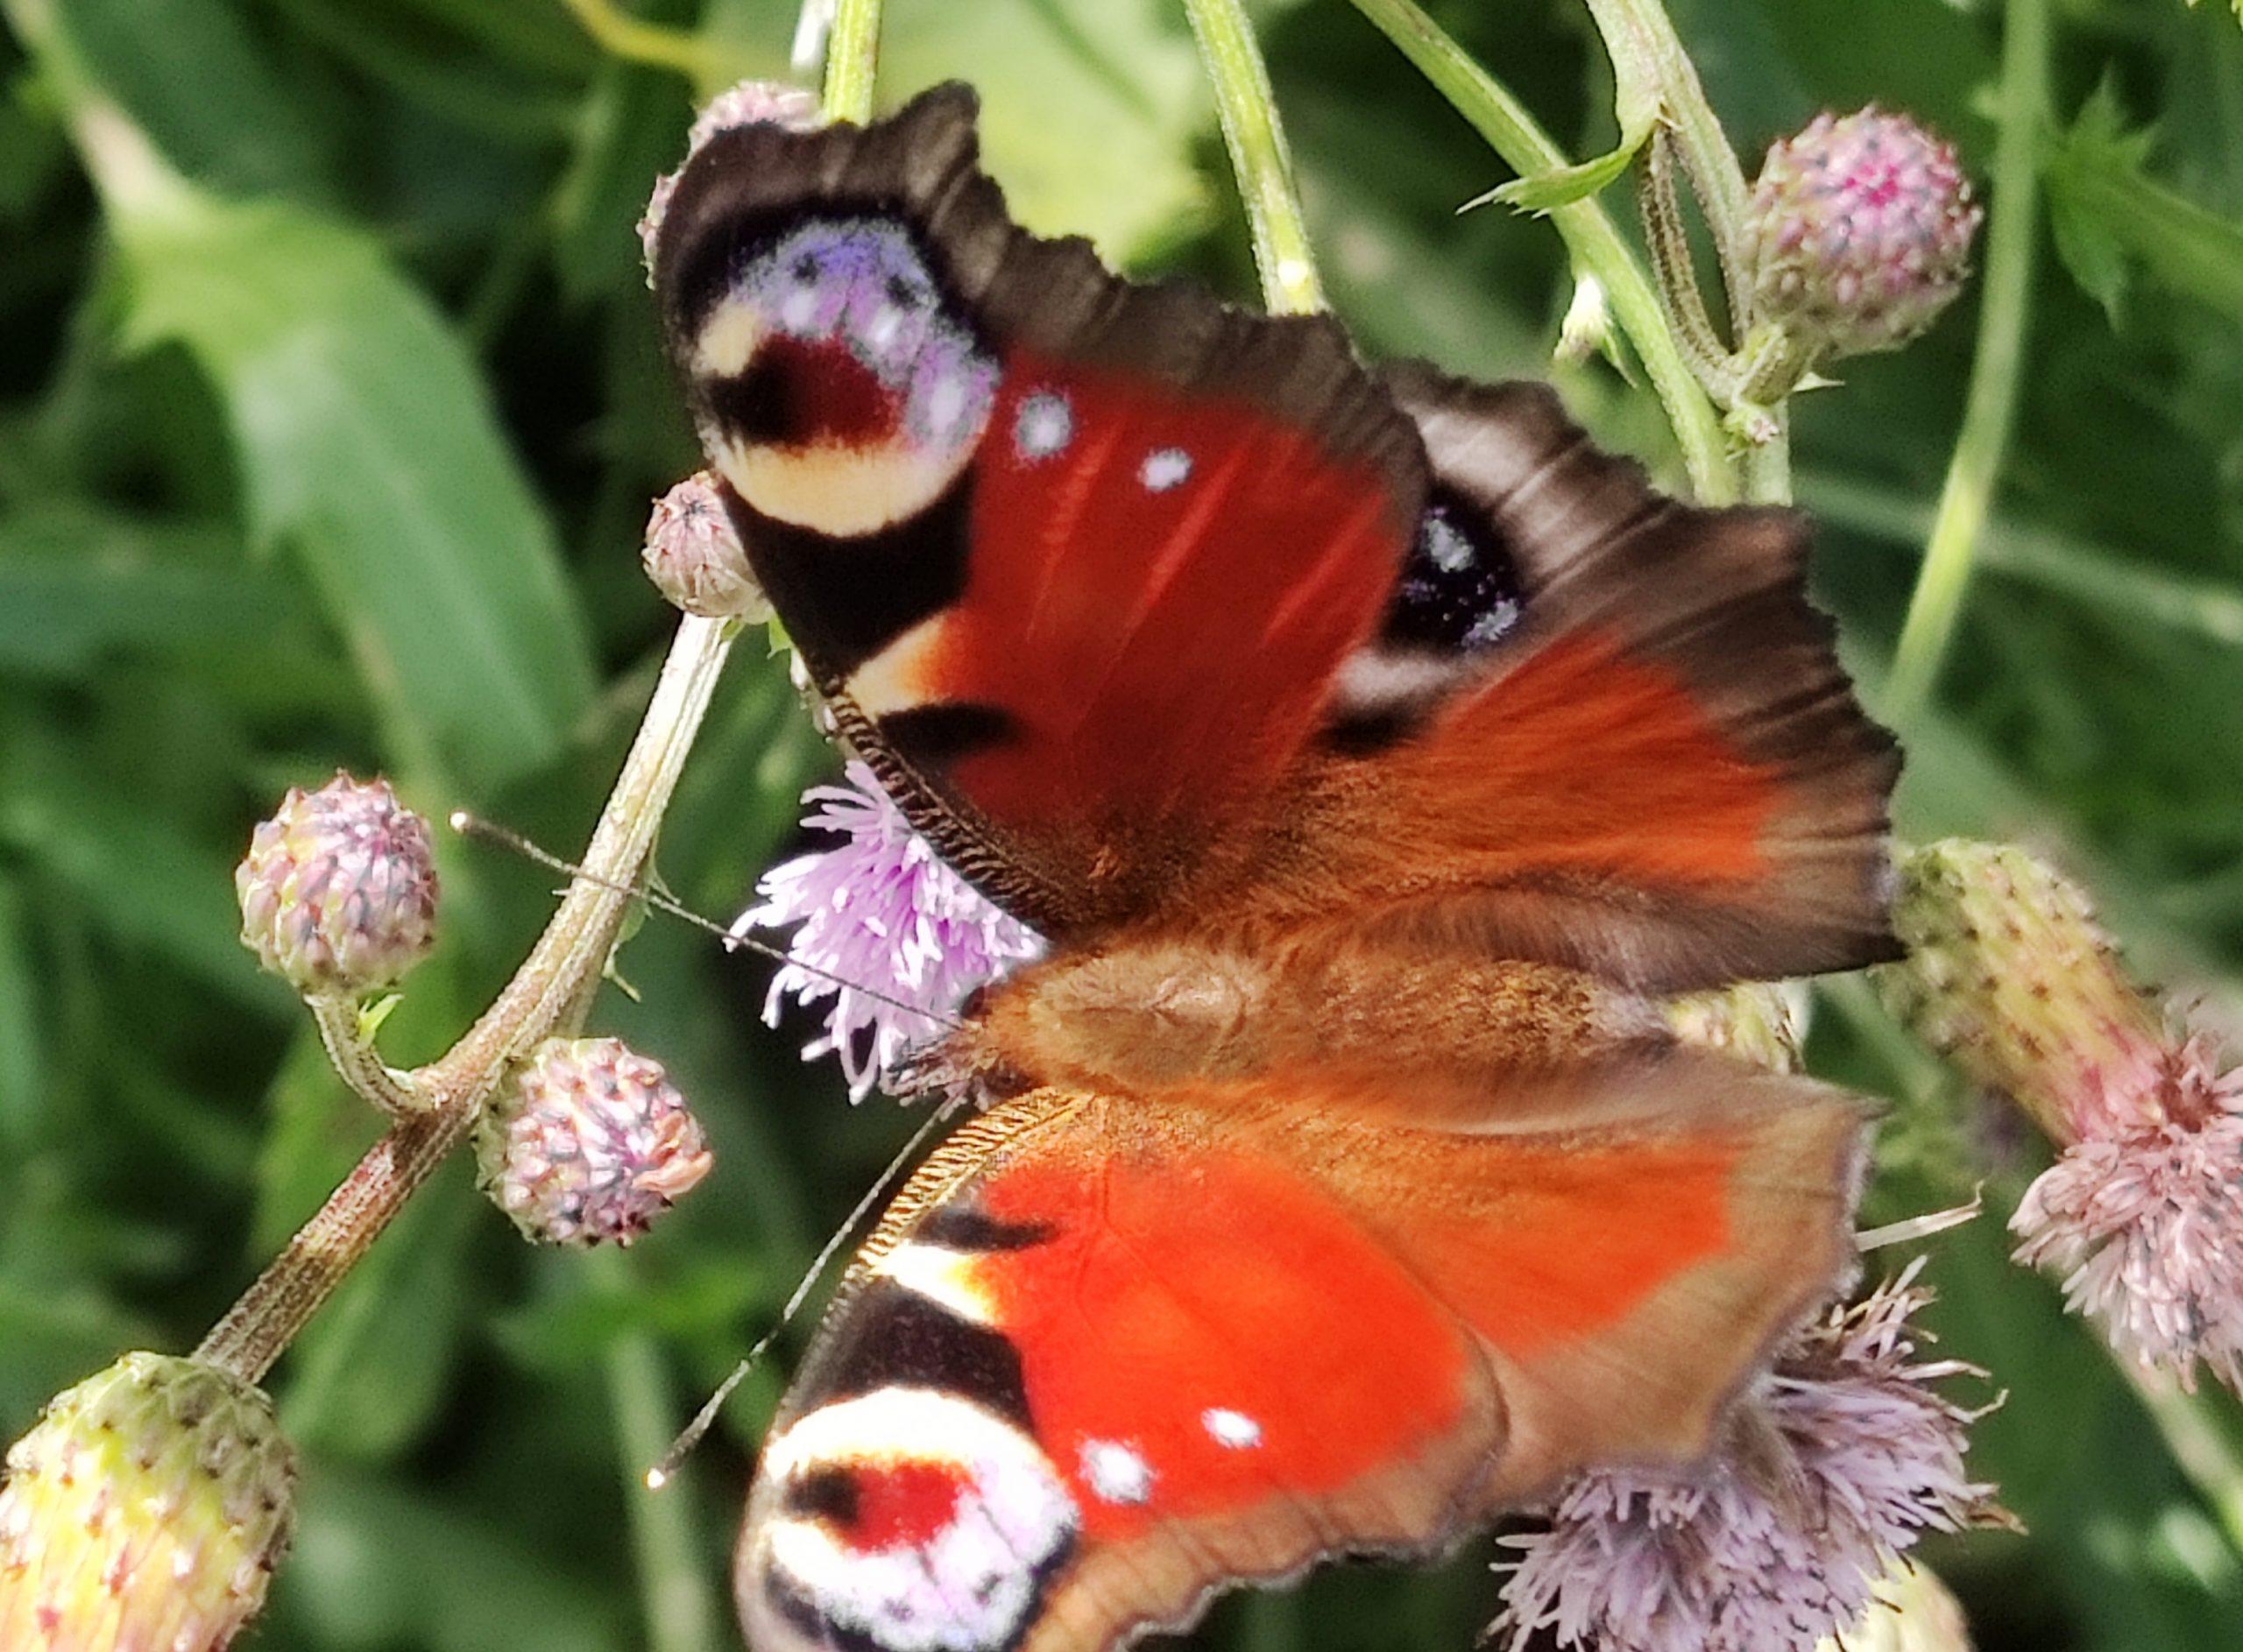 Methamorphose, Schmetterling, Transformation